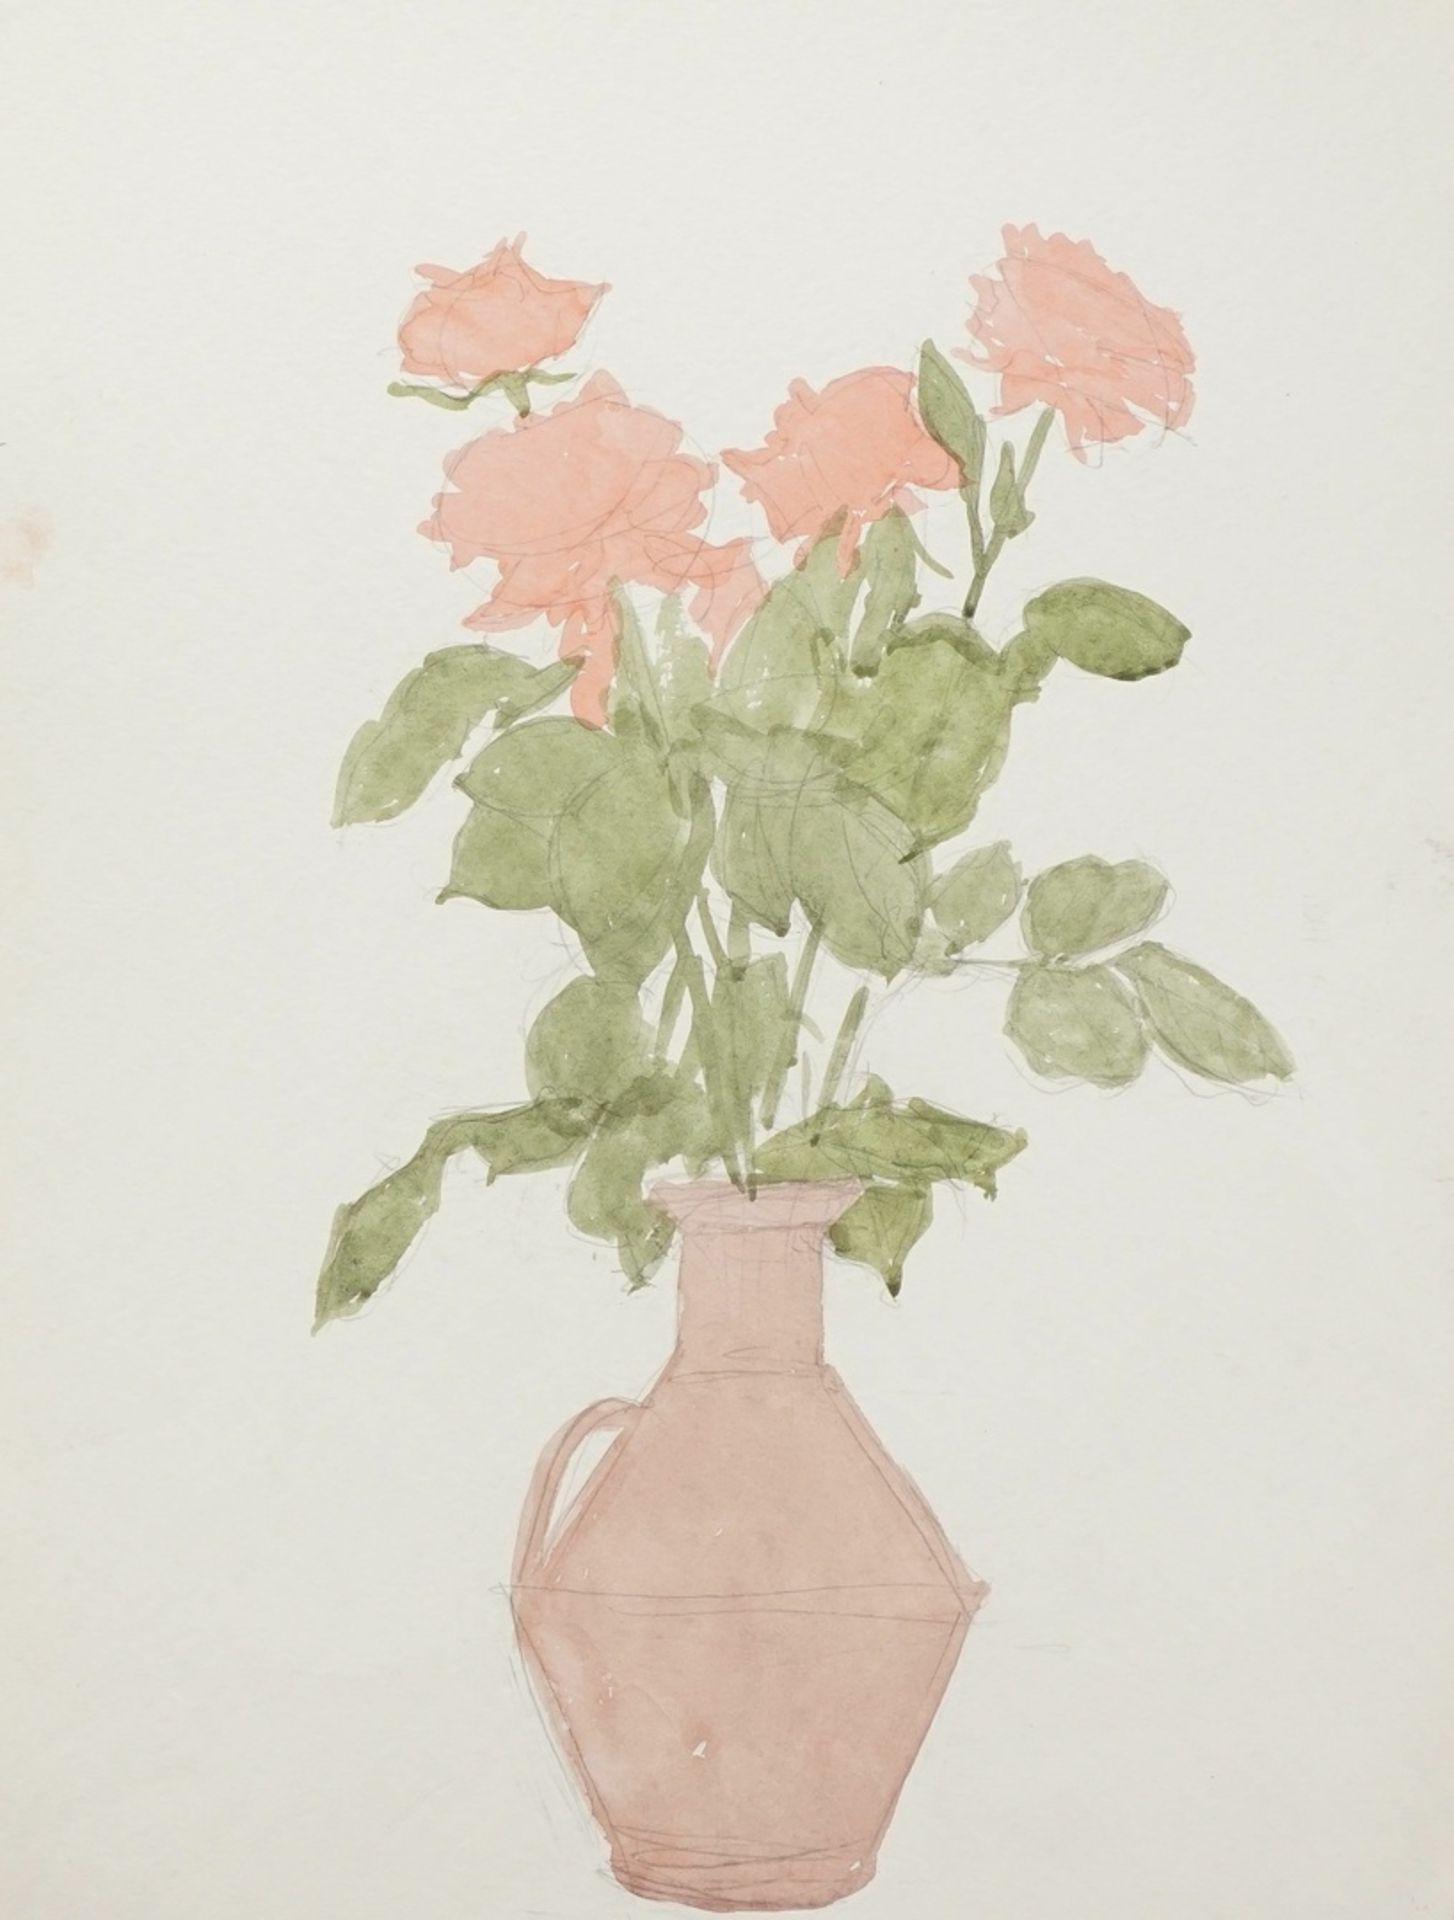 Franz Werneke, Rosen im Tonkrug